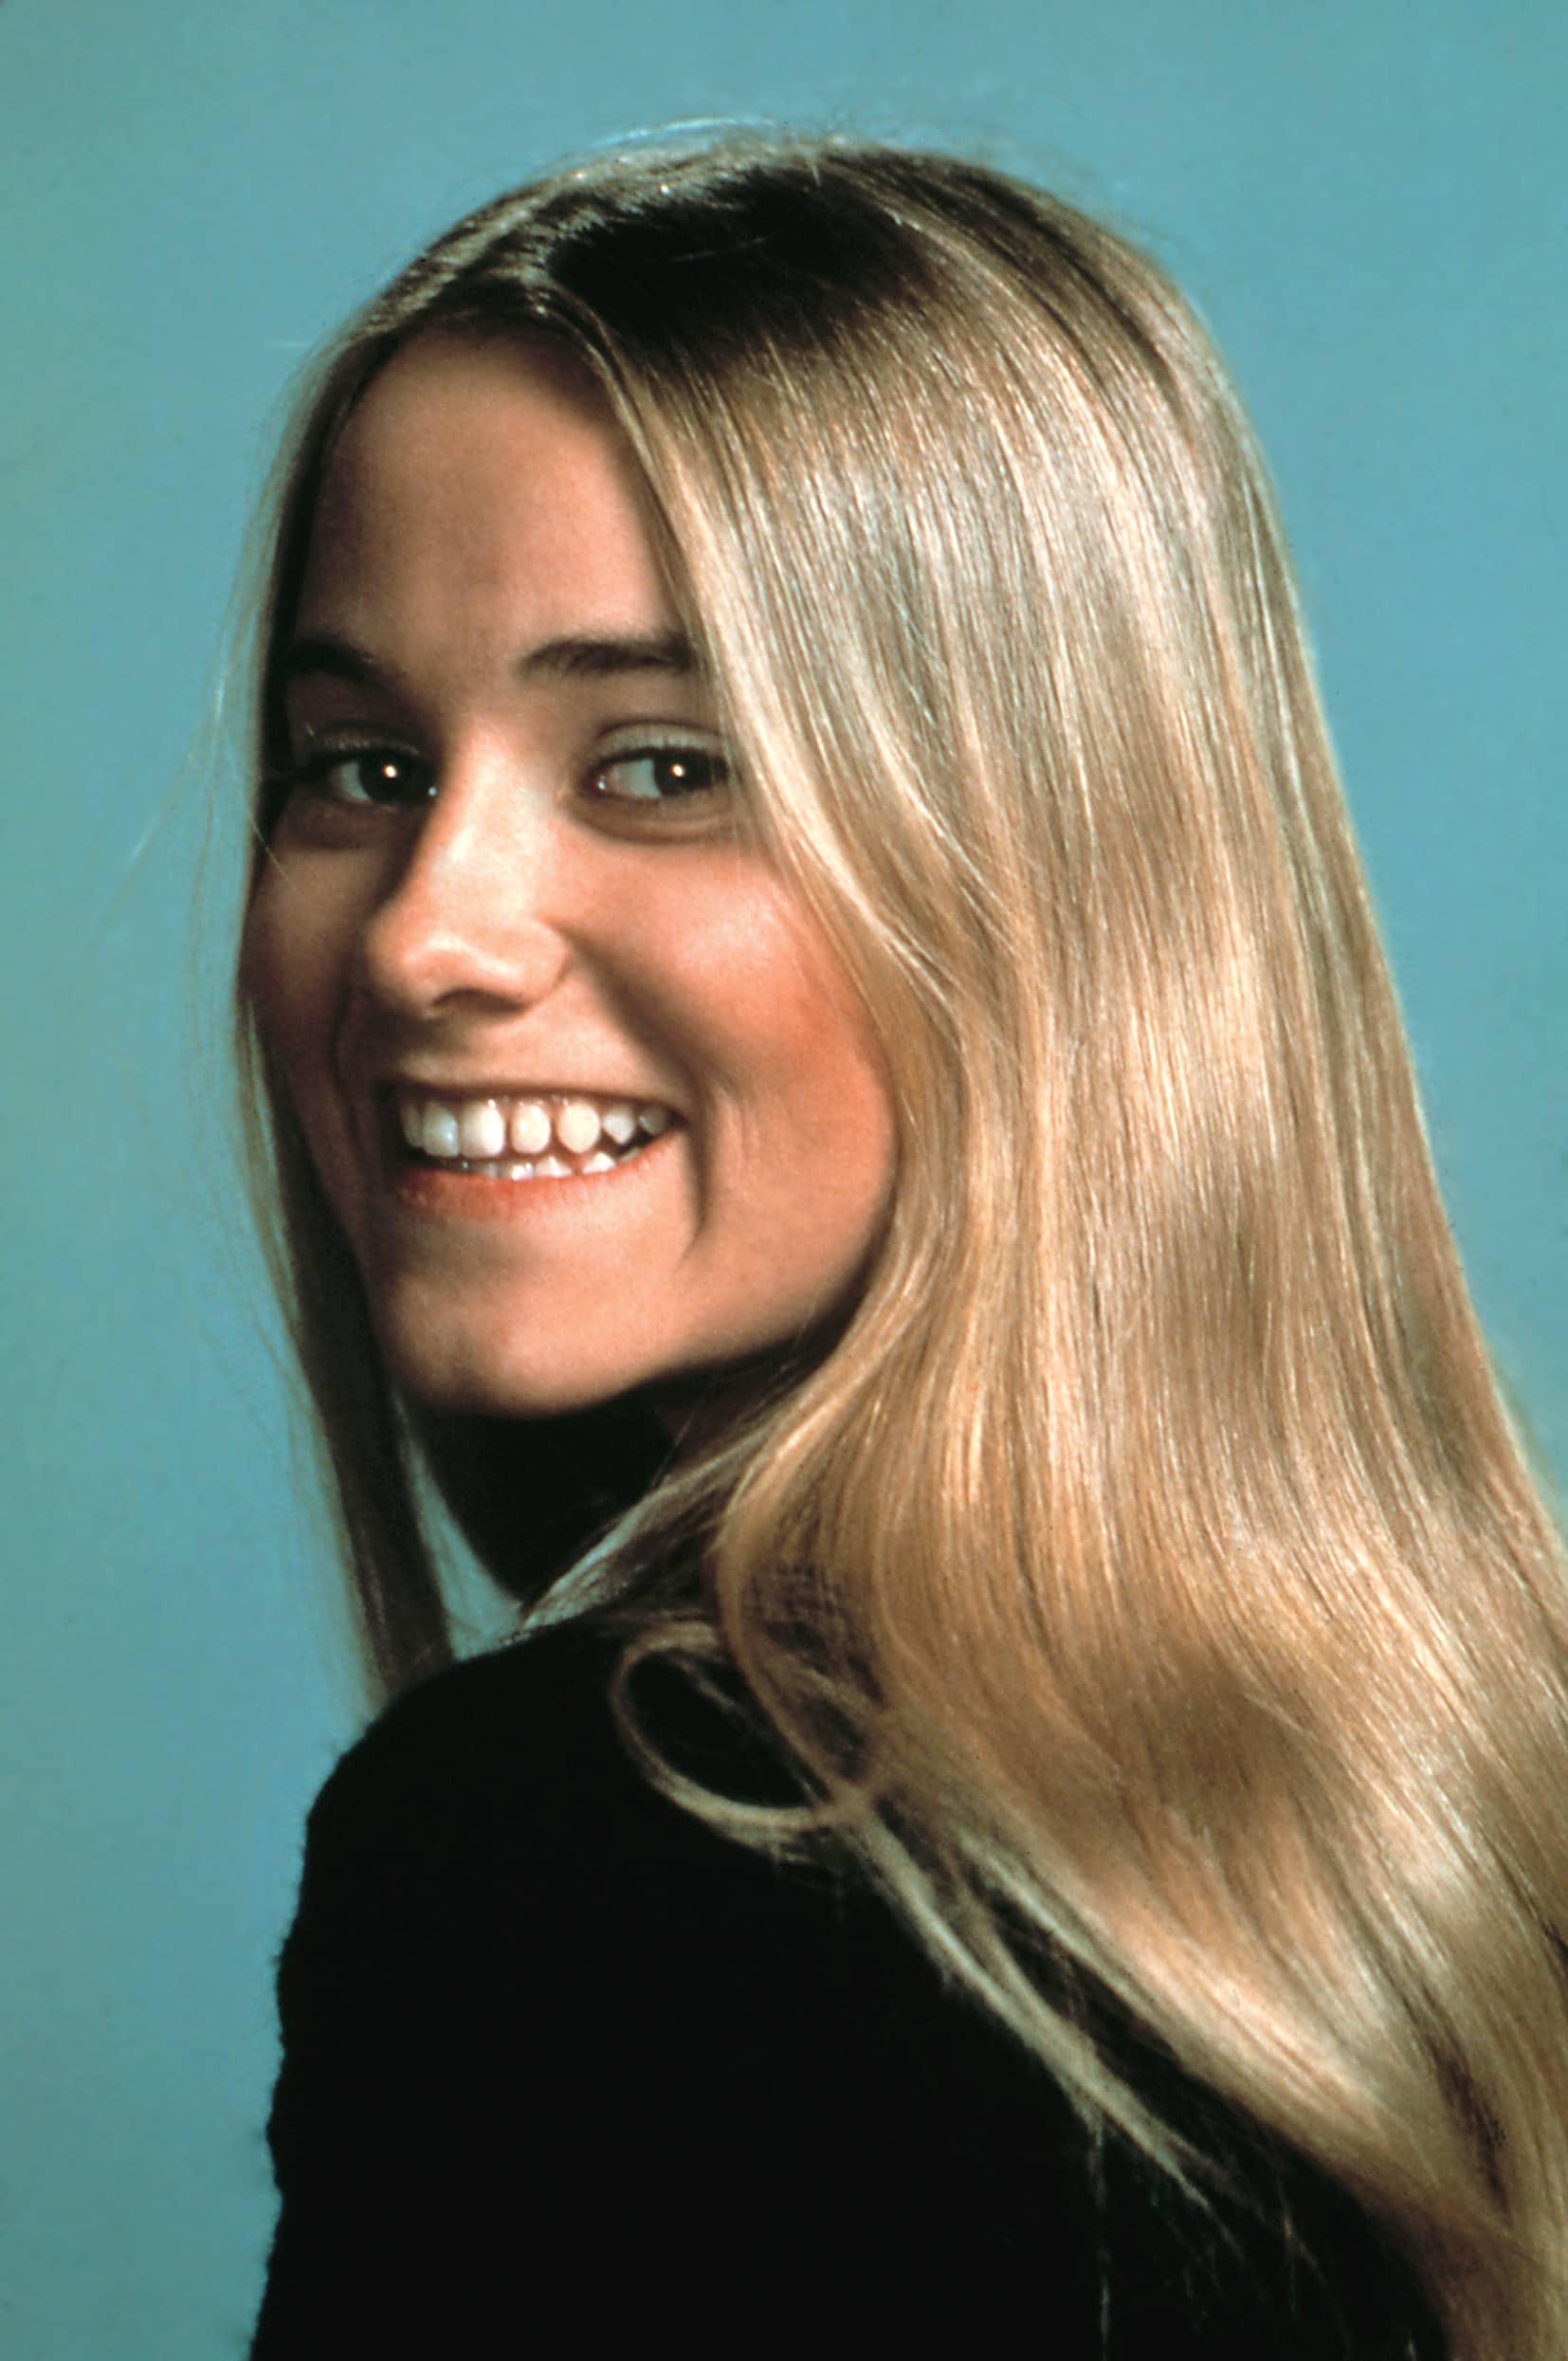 BRADY BUNCH, Maureen McCormick, 1969-1974